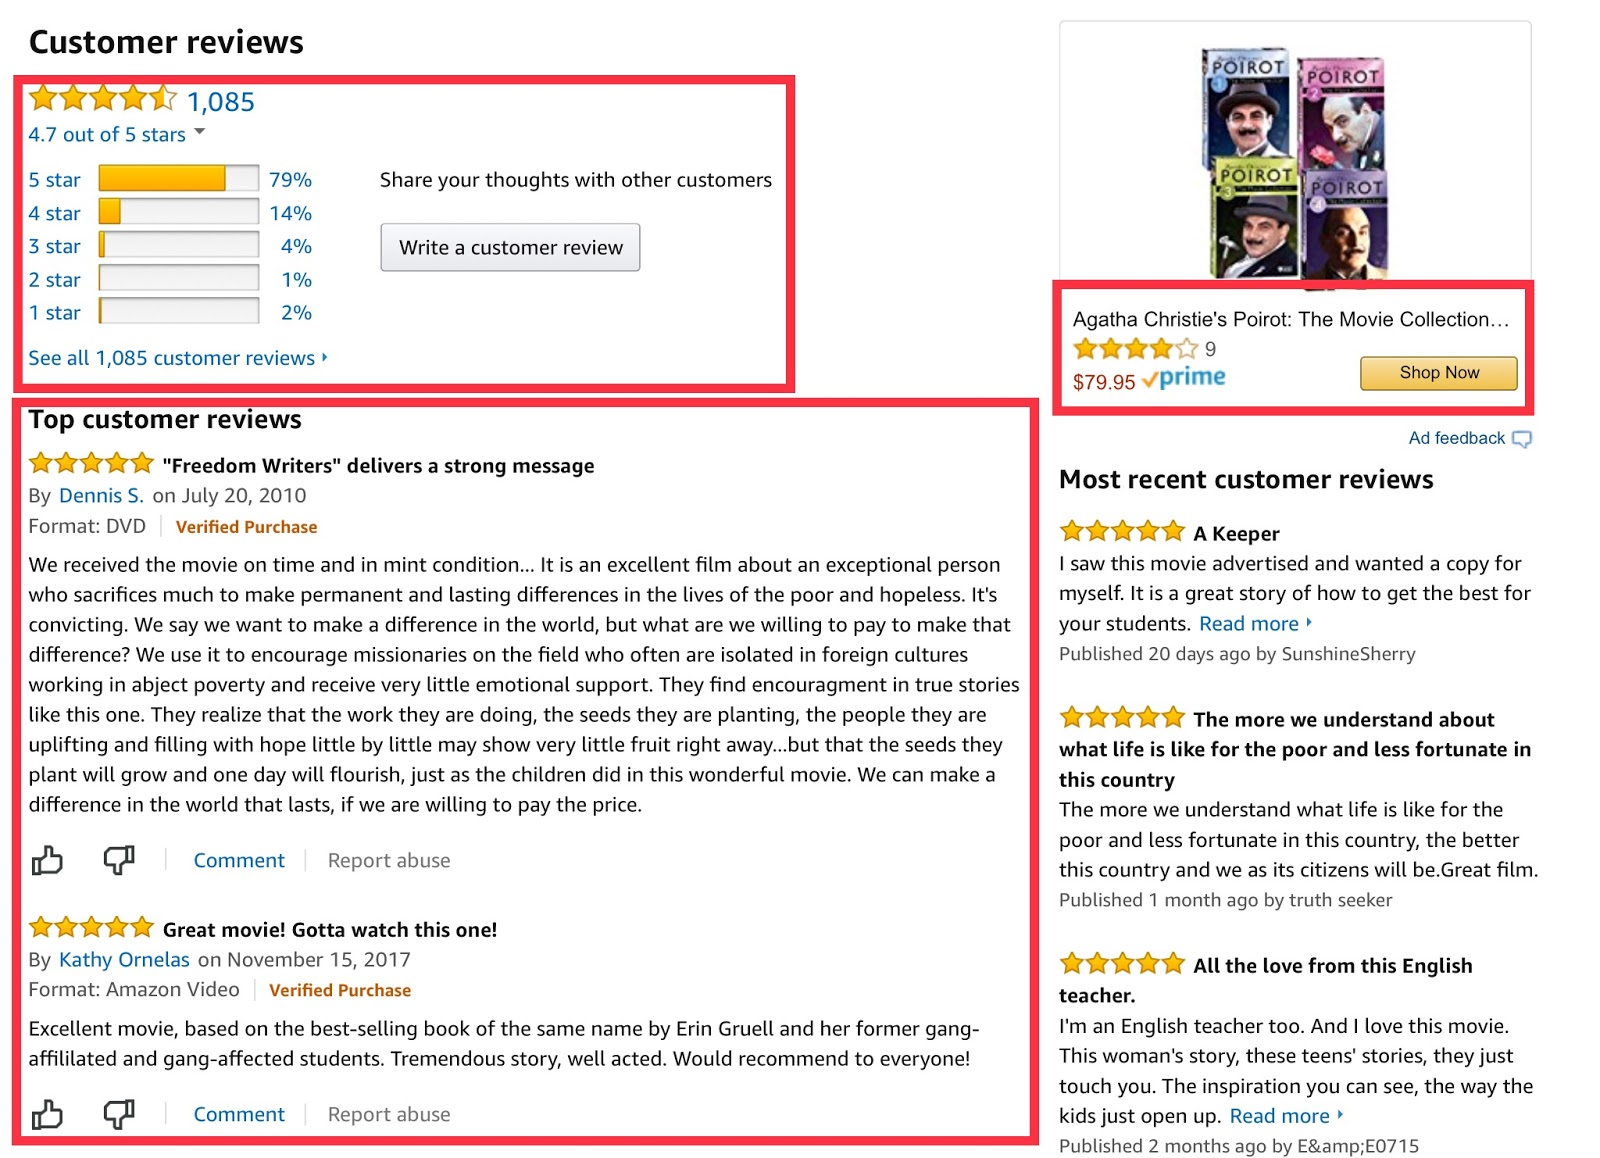 Amazon uses customer reviews to maximum effect.